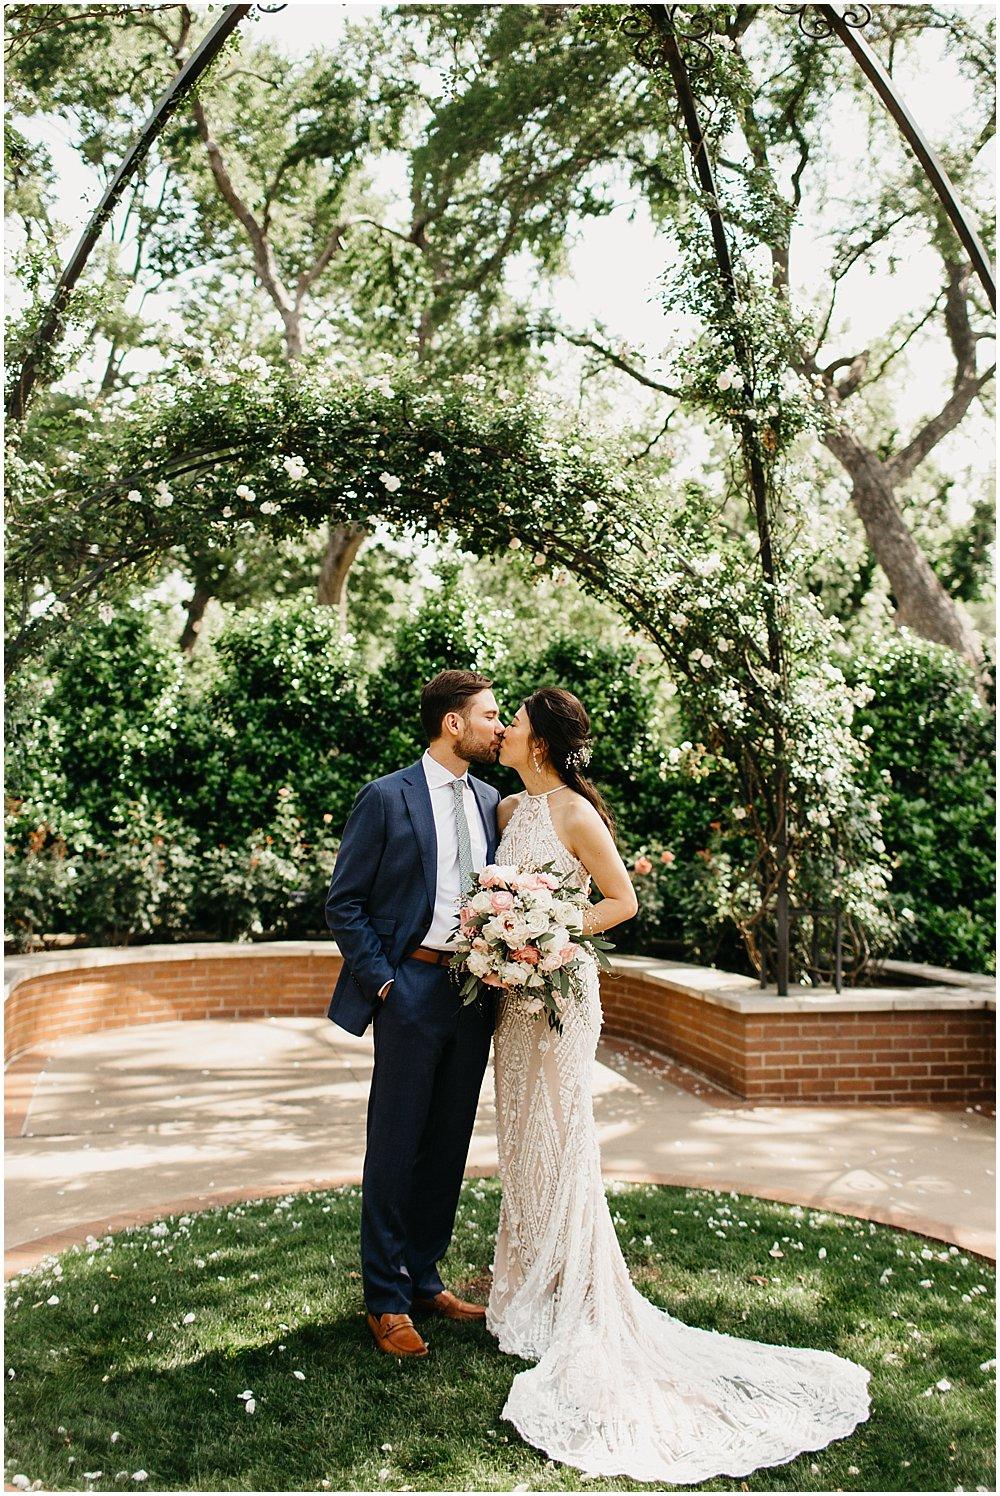 Becca Kracht Photography_Dallas_Texas_Wedding Photography_0083.jpg